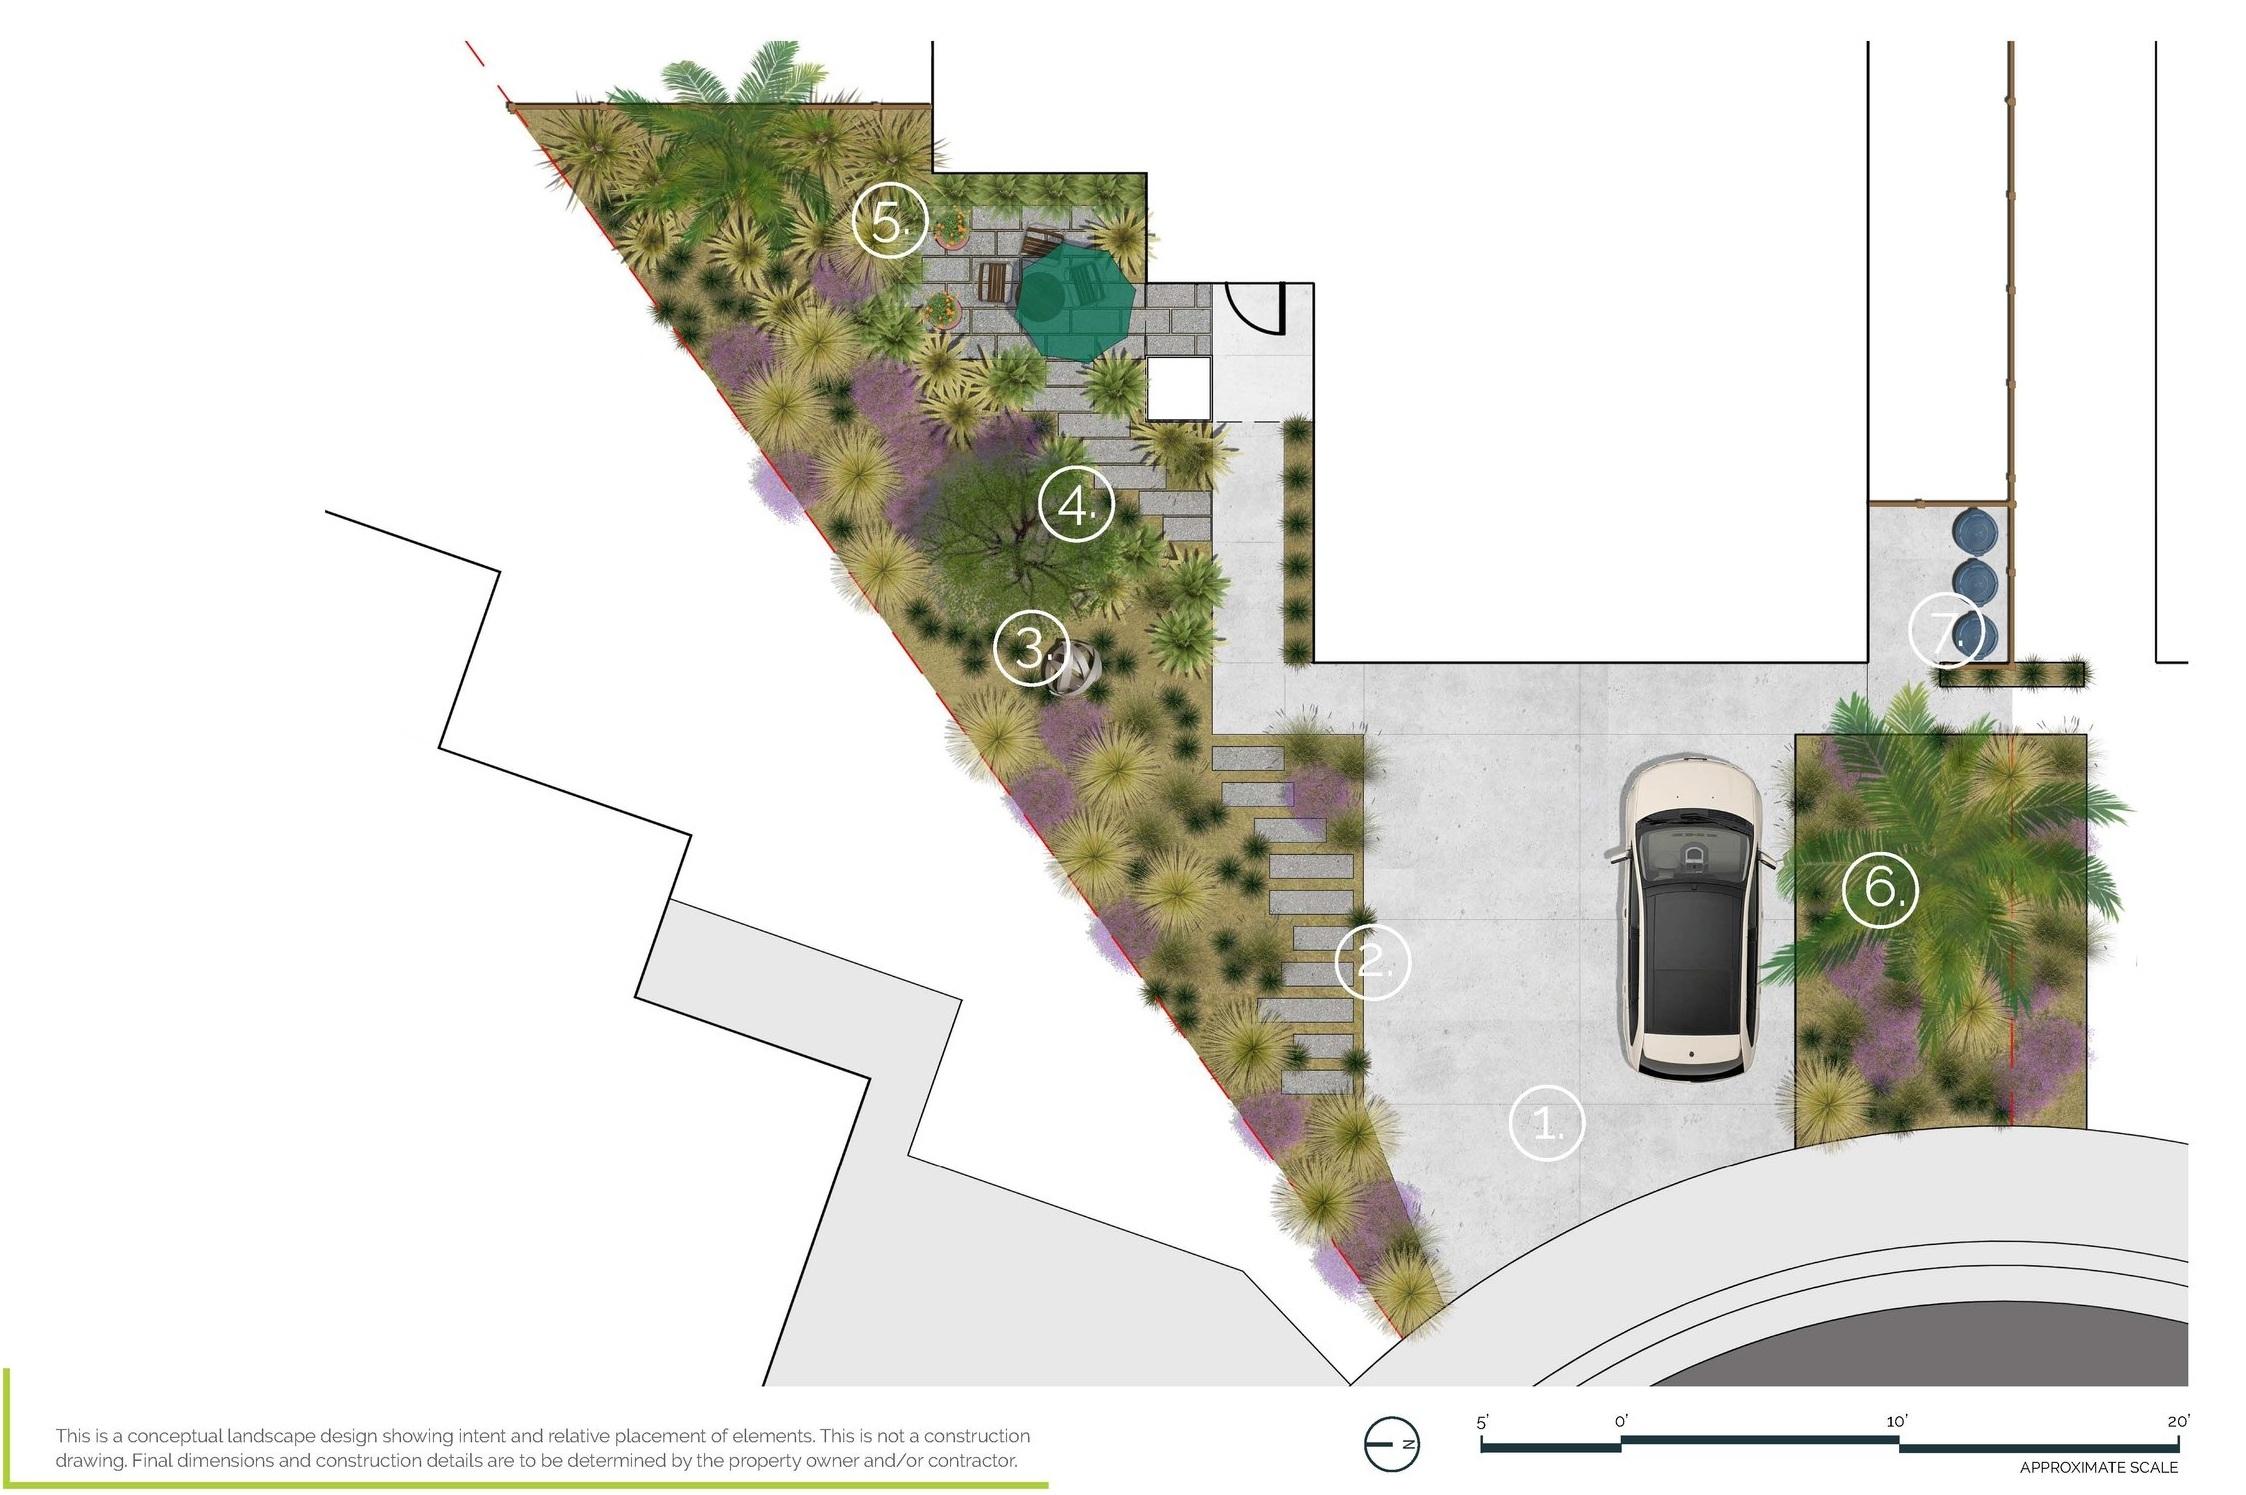 Clarke+Residence+Plan.jpg